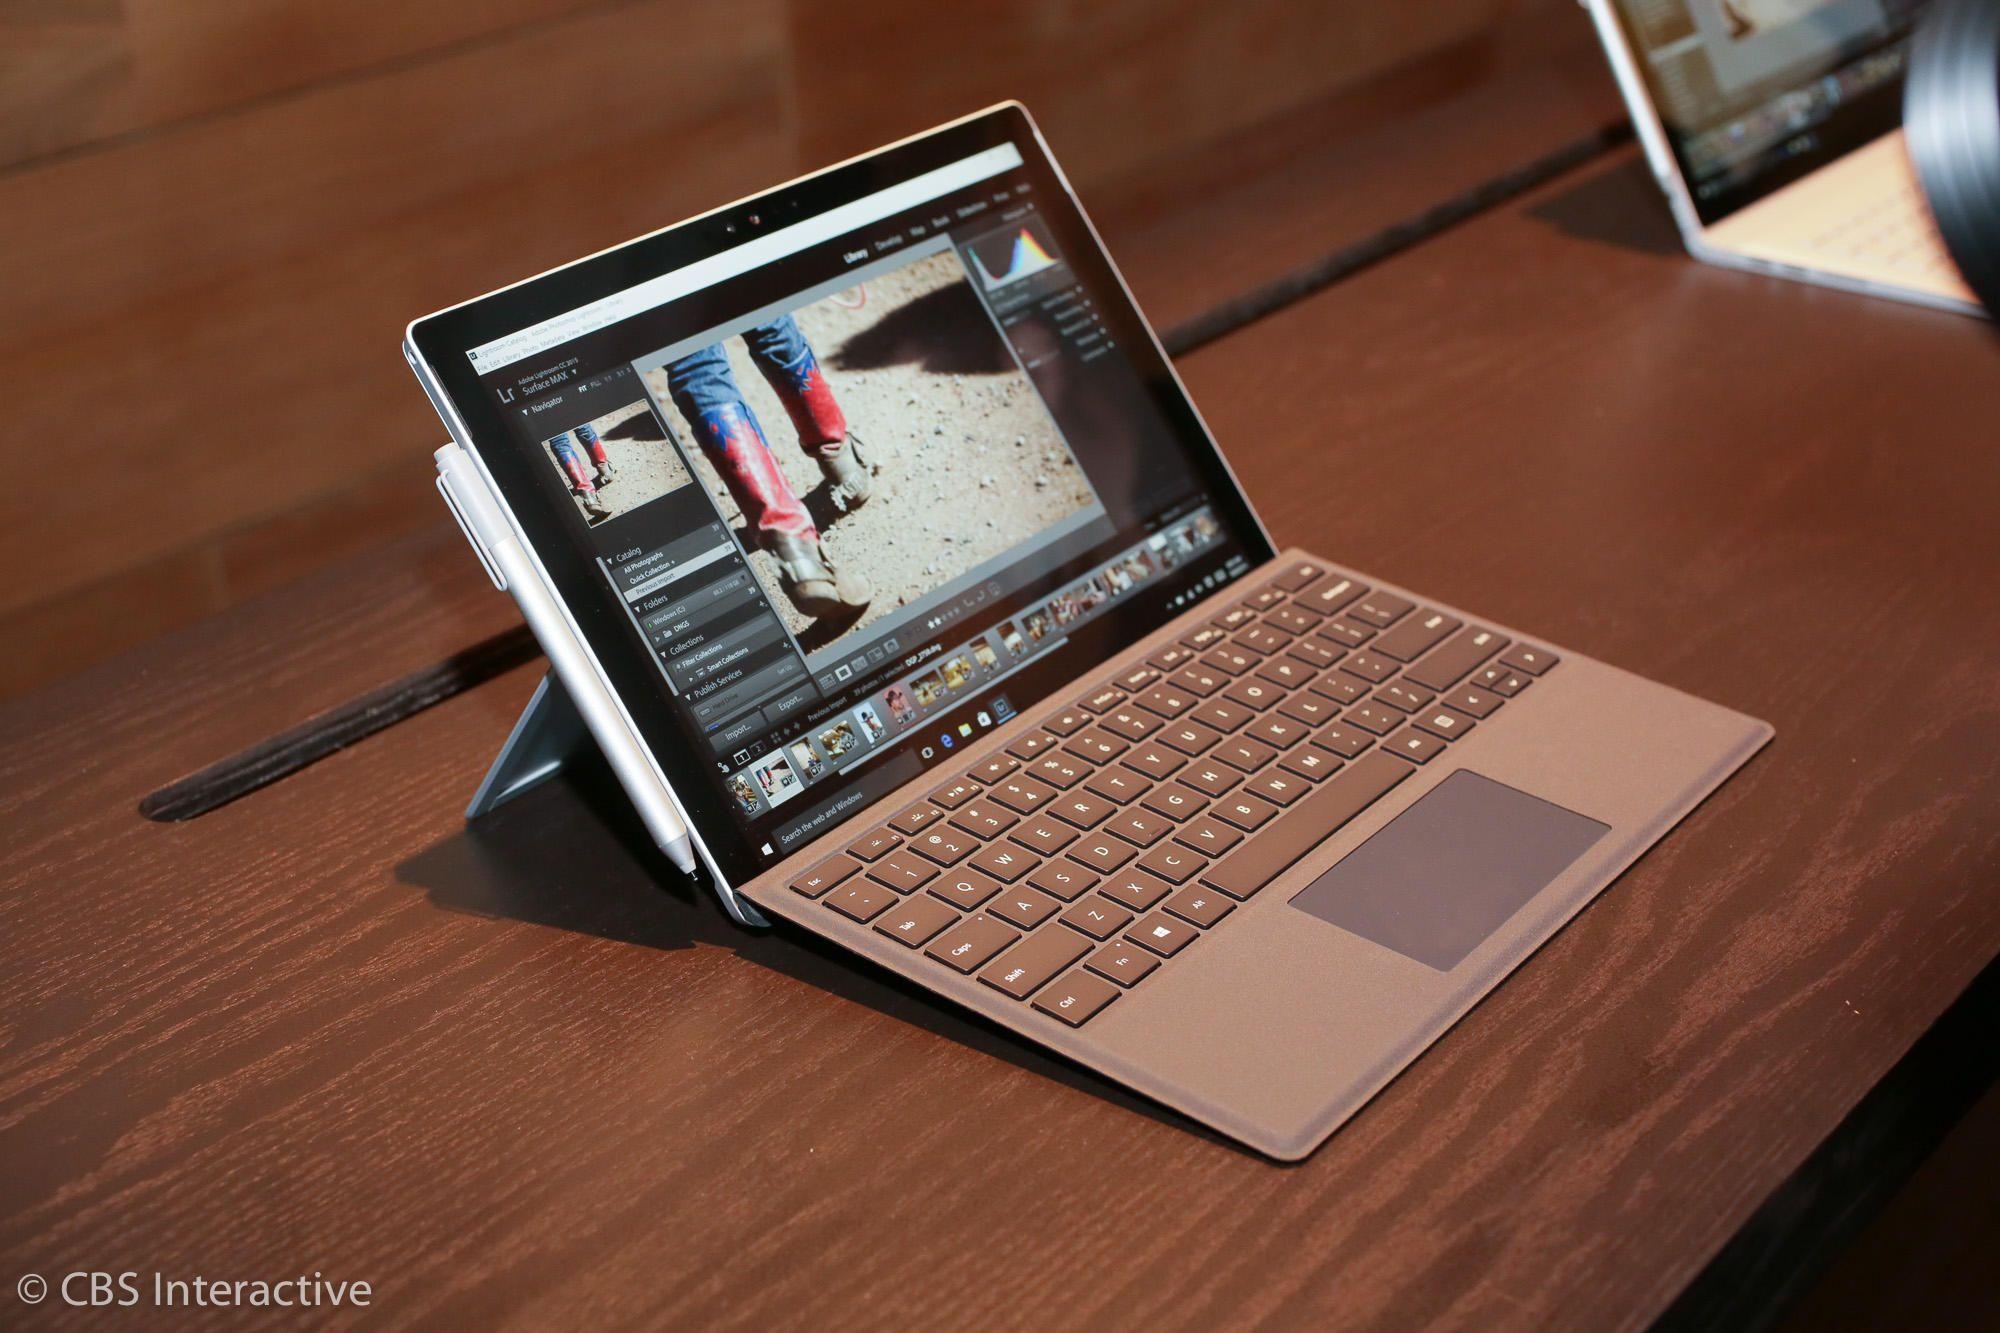 Microsoft Surface Pro 4 Microsoft Surface Pro Microsoft Surface Pro 4 Microsoft Surface